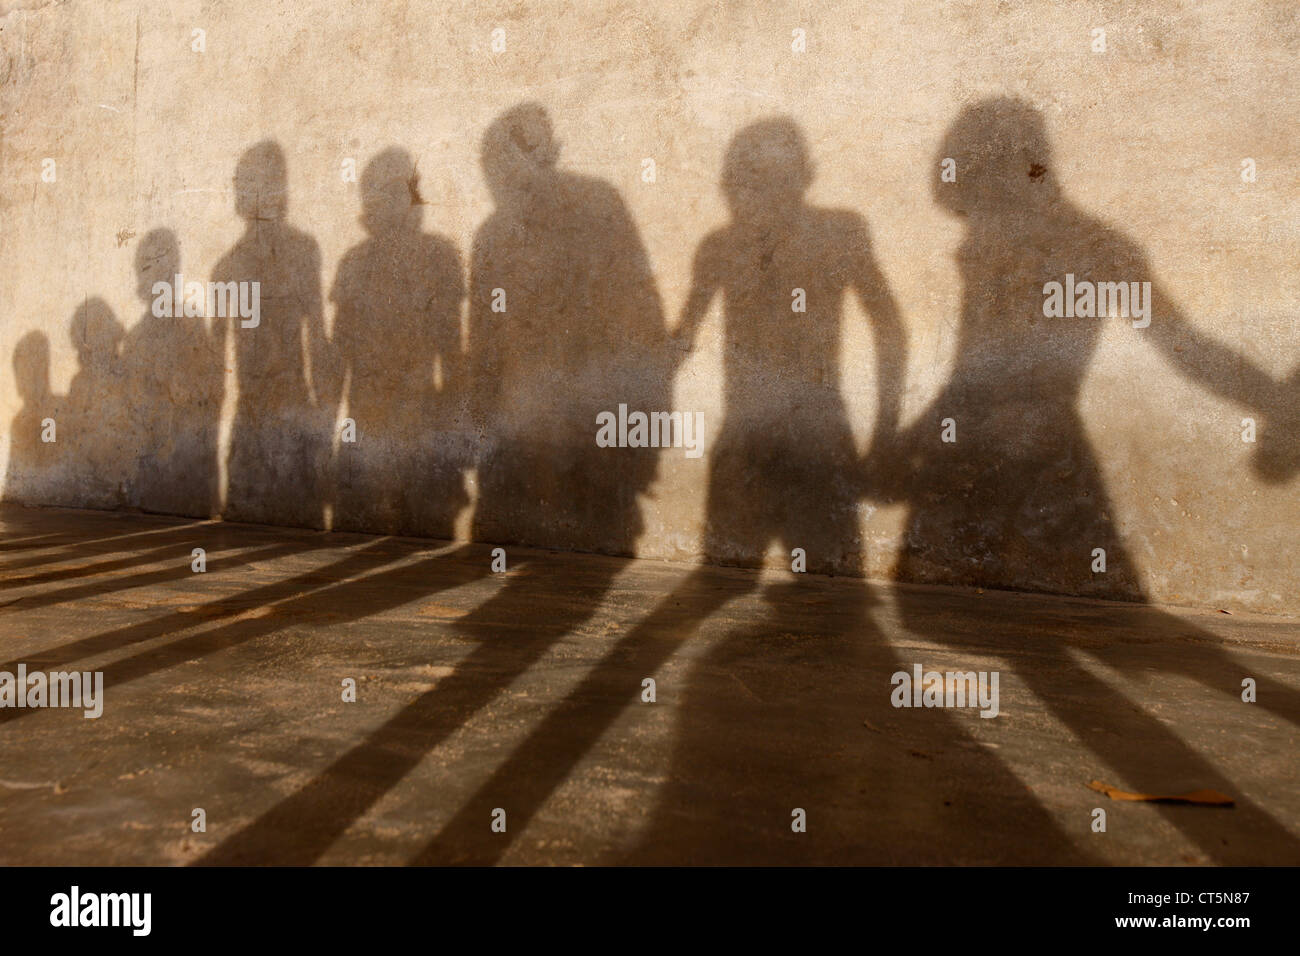 Grupo de niños Imagen De Stock